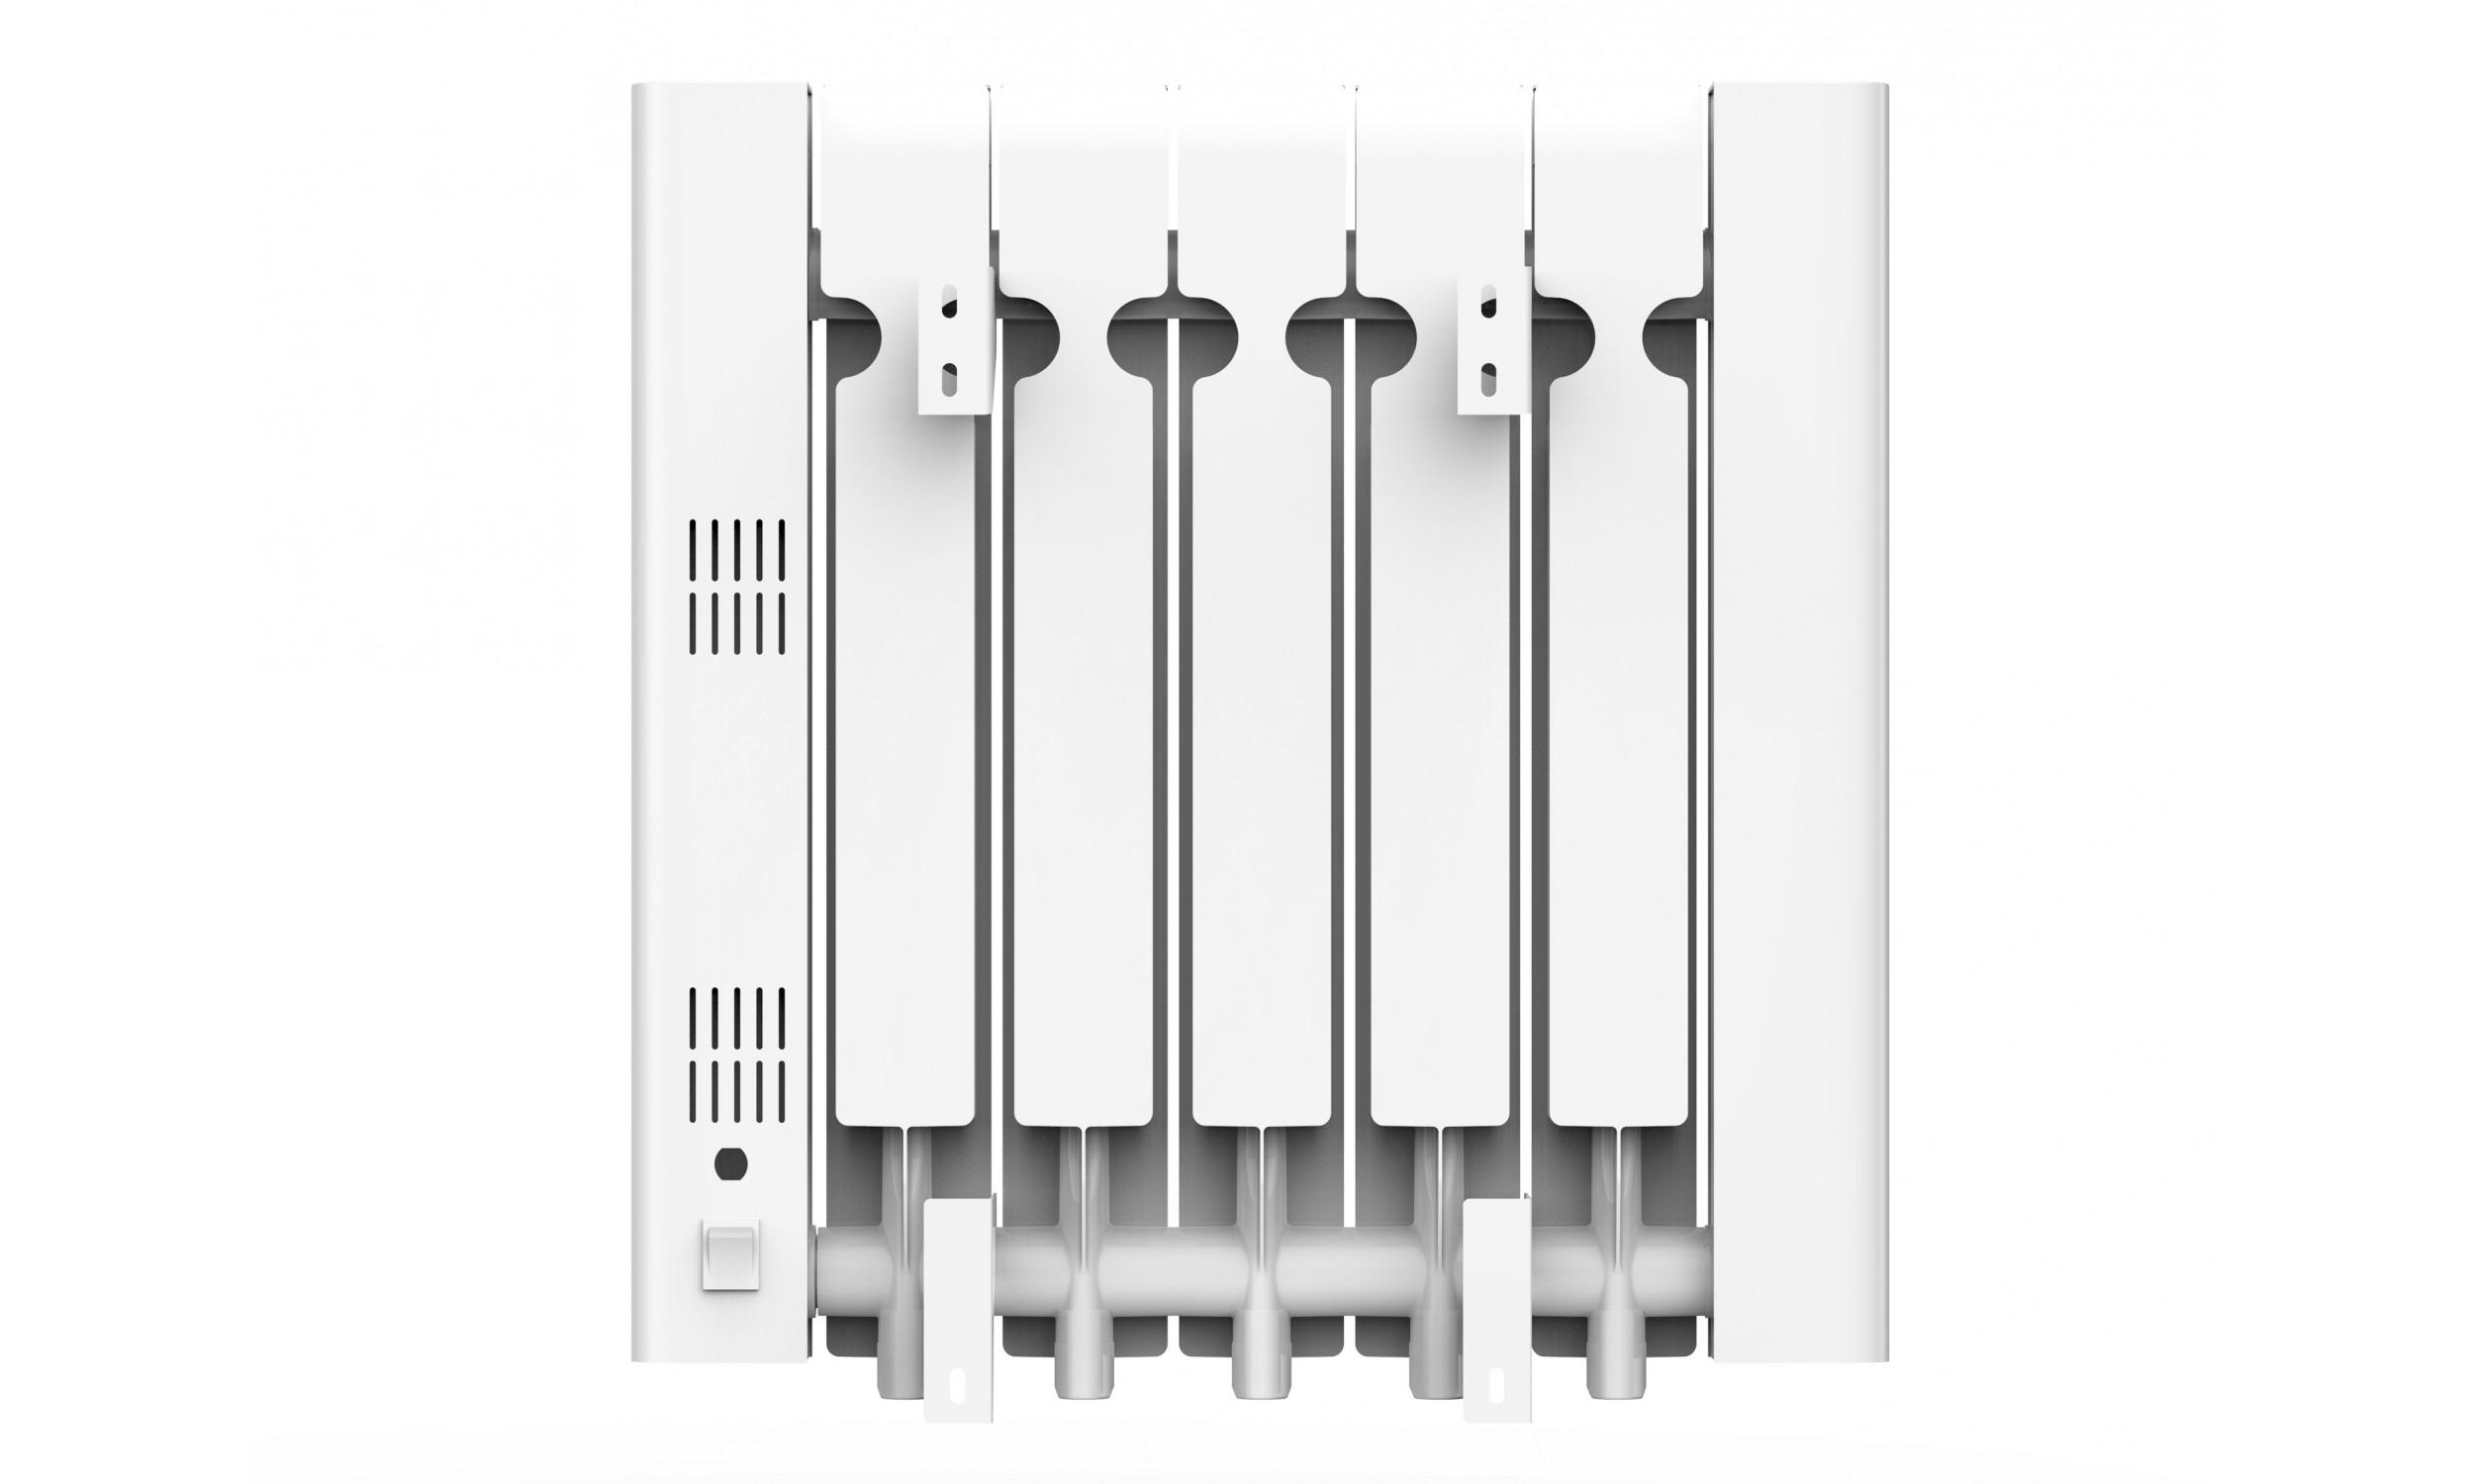 Digital Thermal Inertia radiator with internal fluid, 900W, wifi, Radoil A900